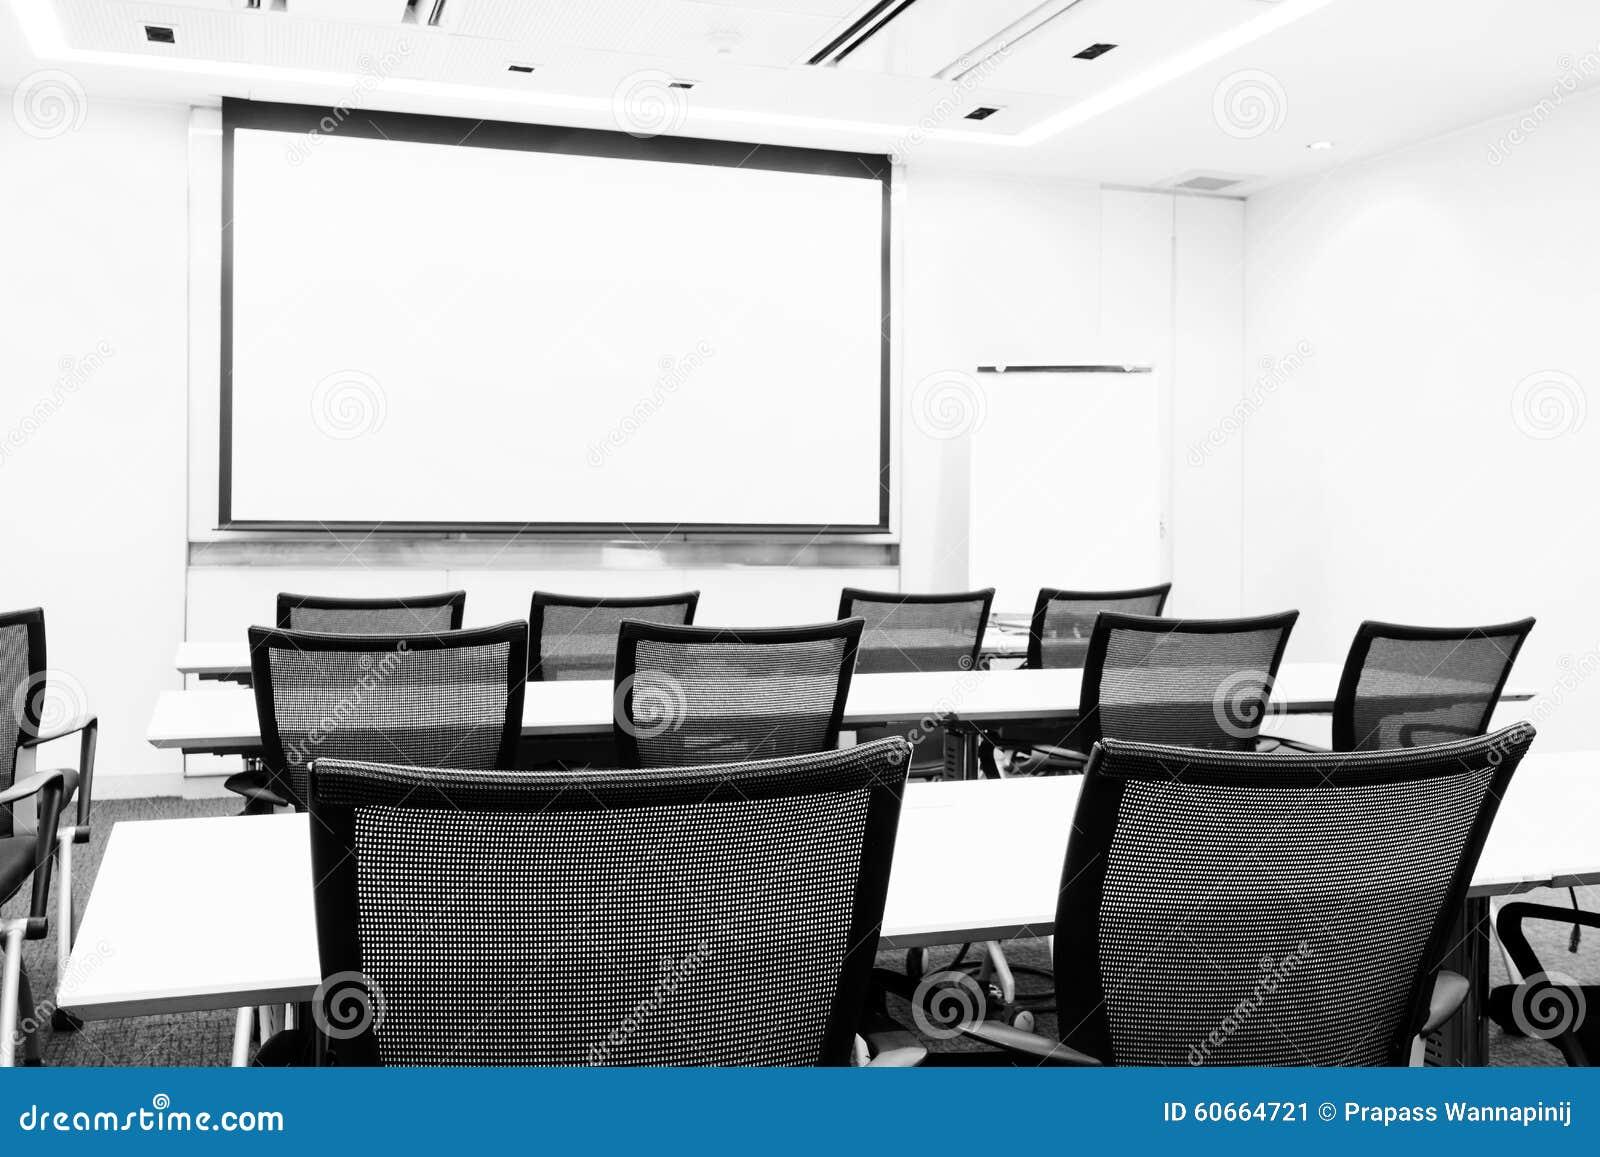 Business meeting seminar presentation room